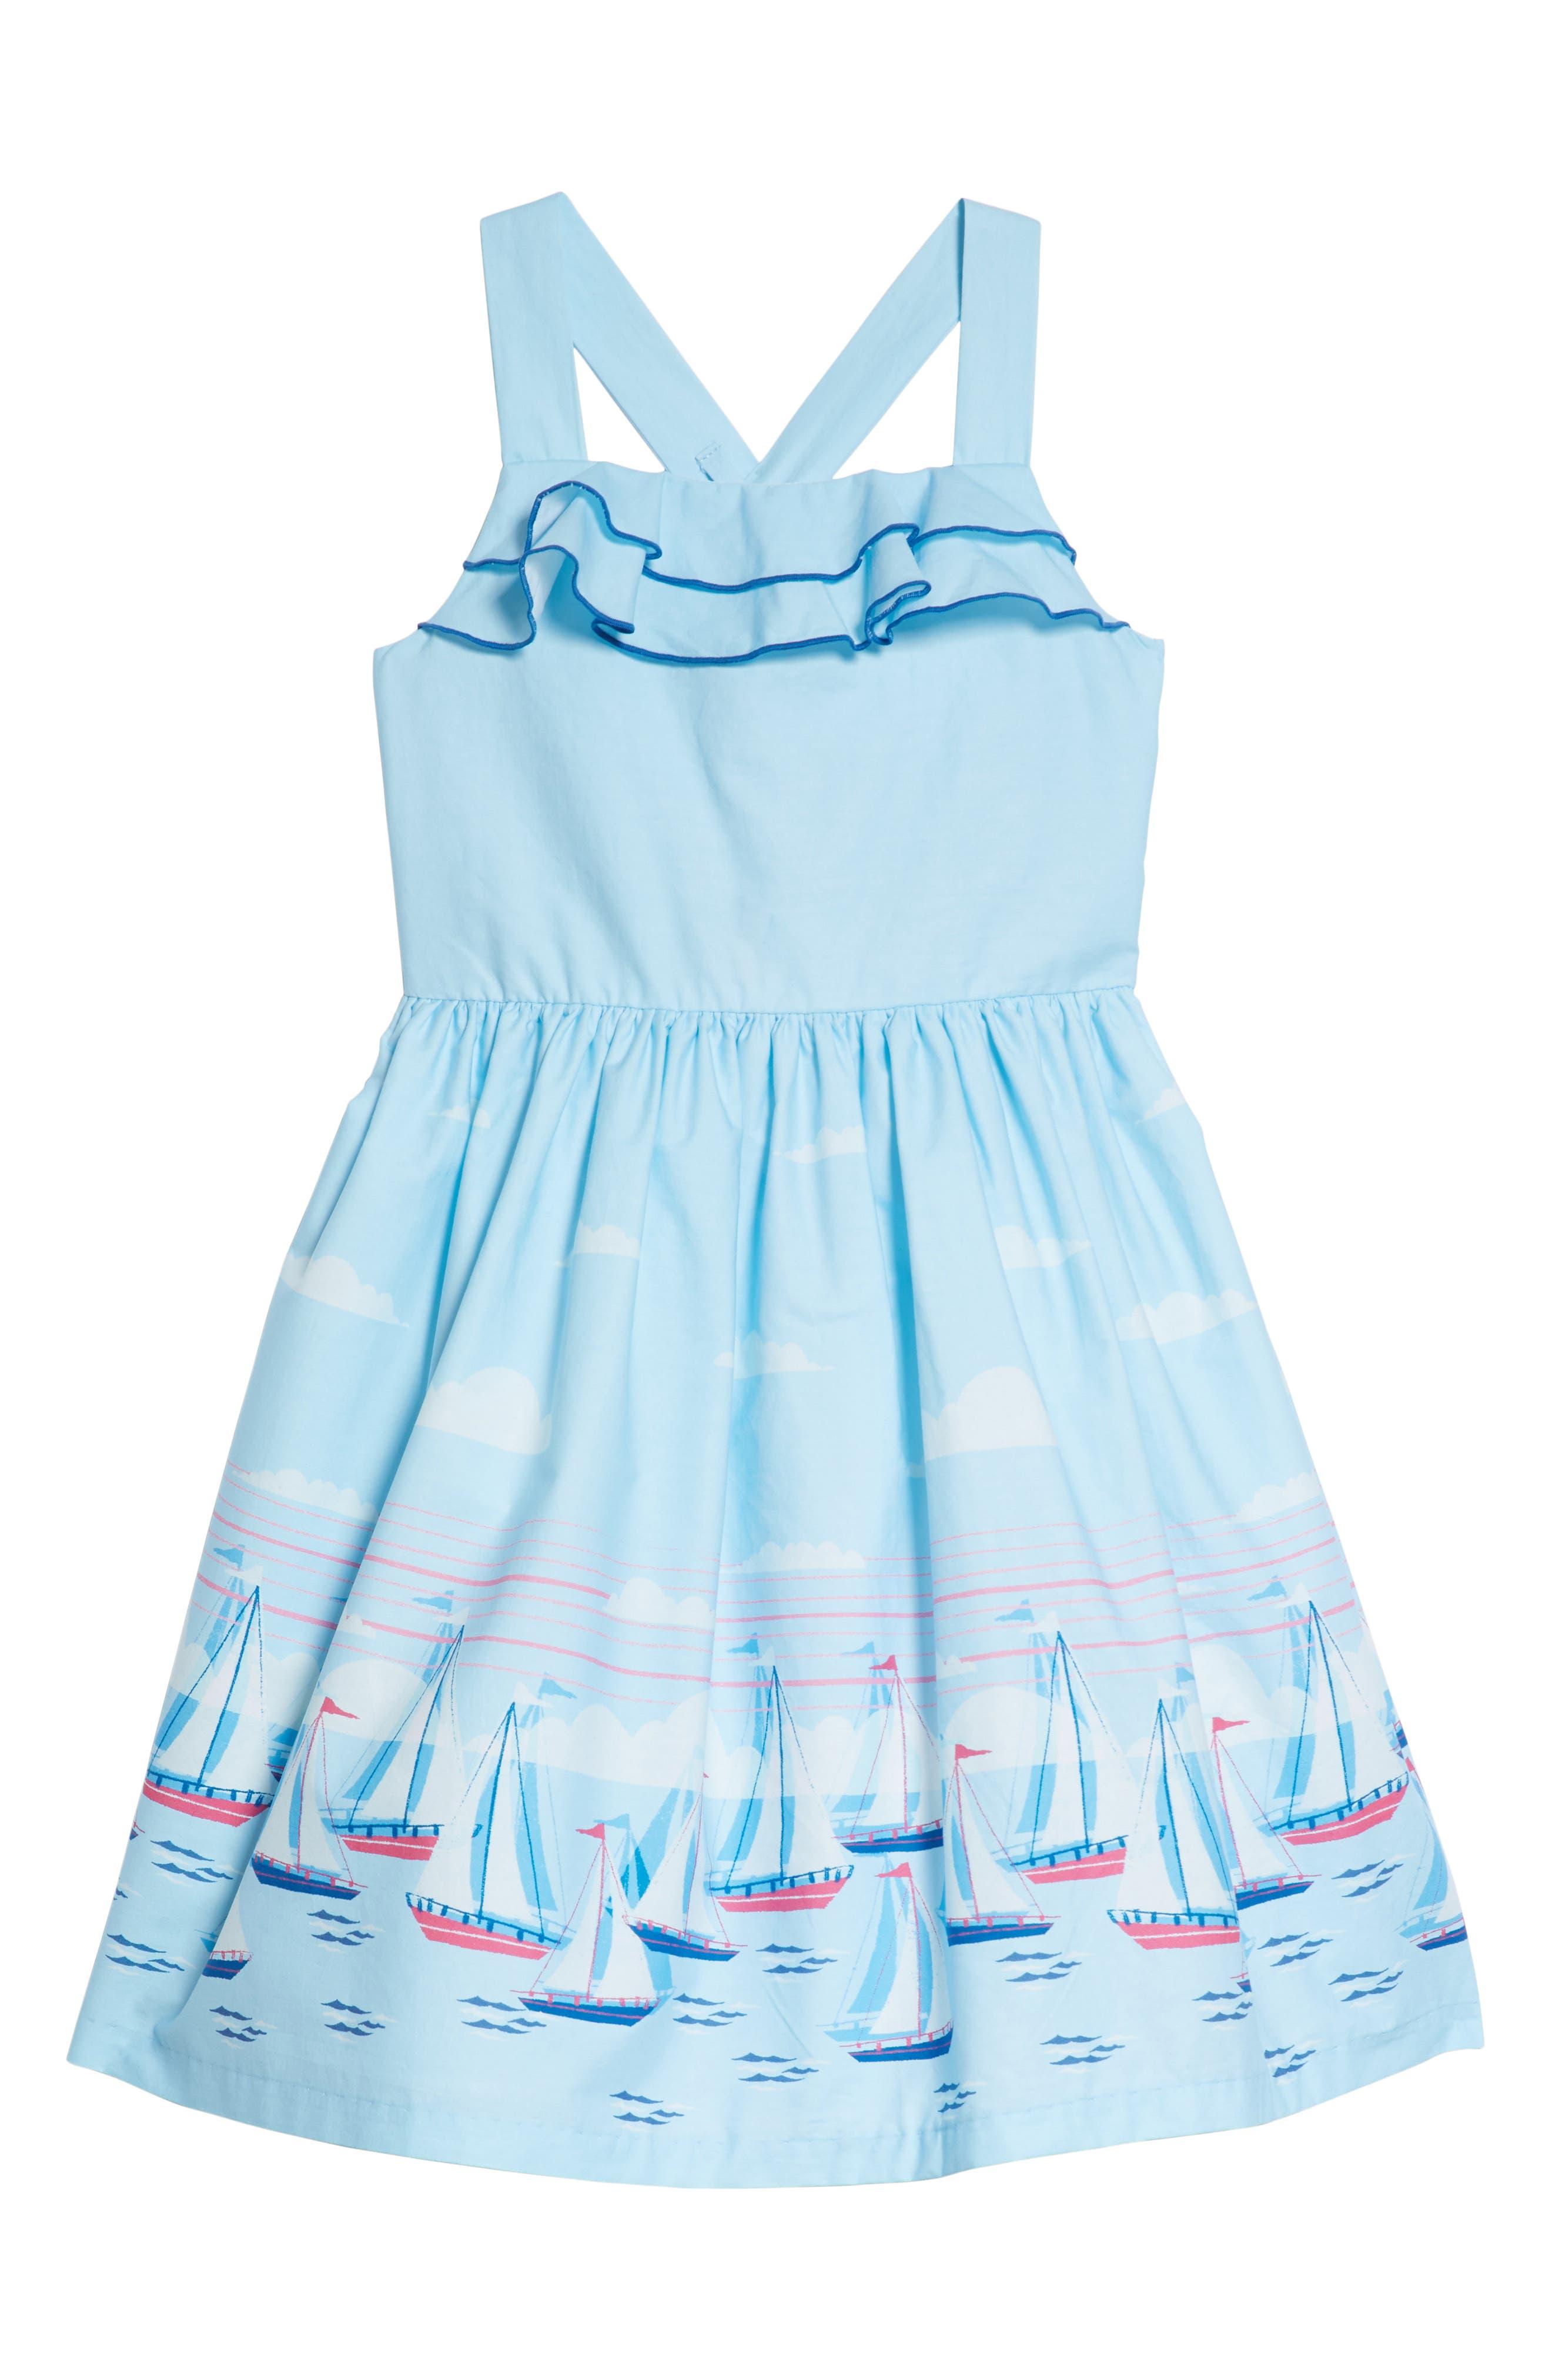 Sailboat Dress,                         Main,                         color, 400